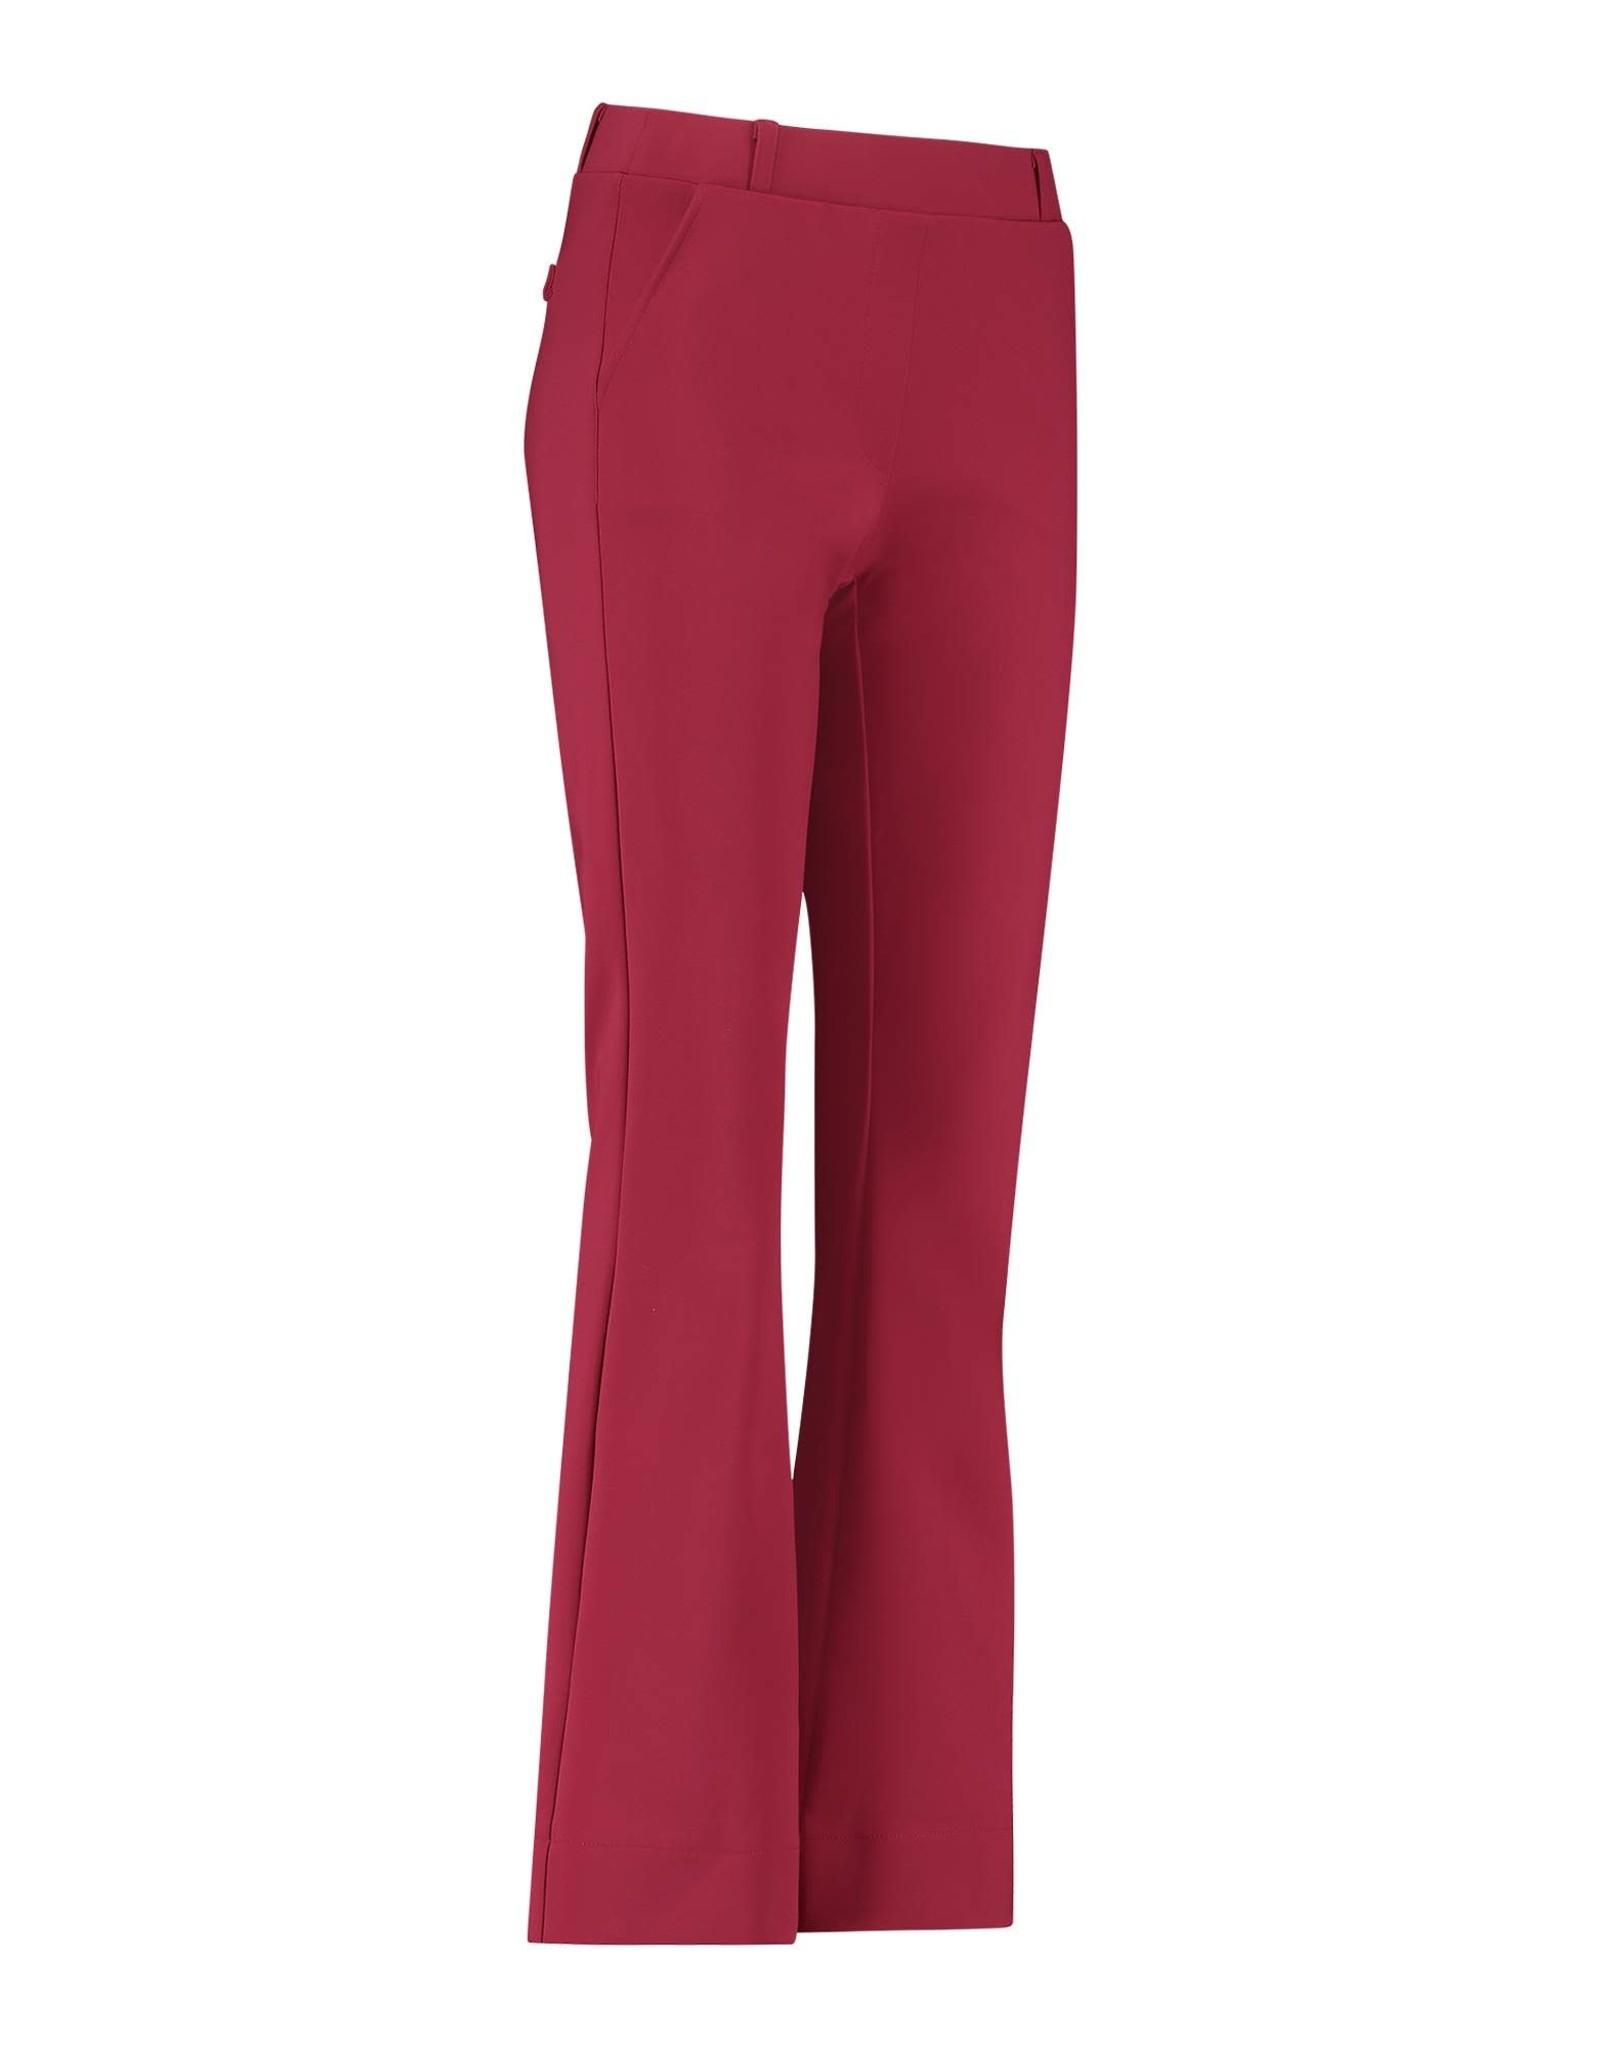 Studio Anneloes SA Flair bondend trousers